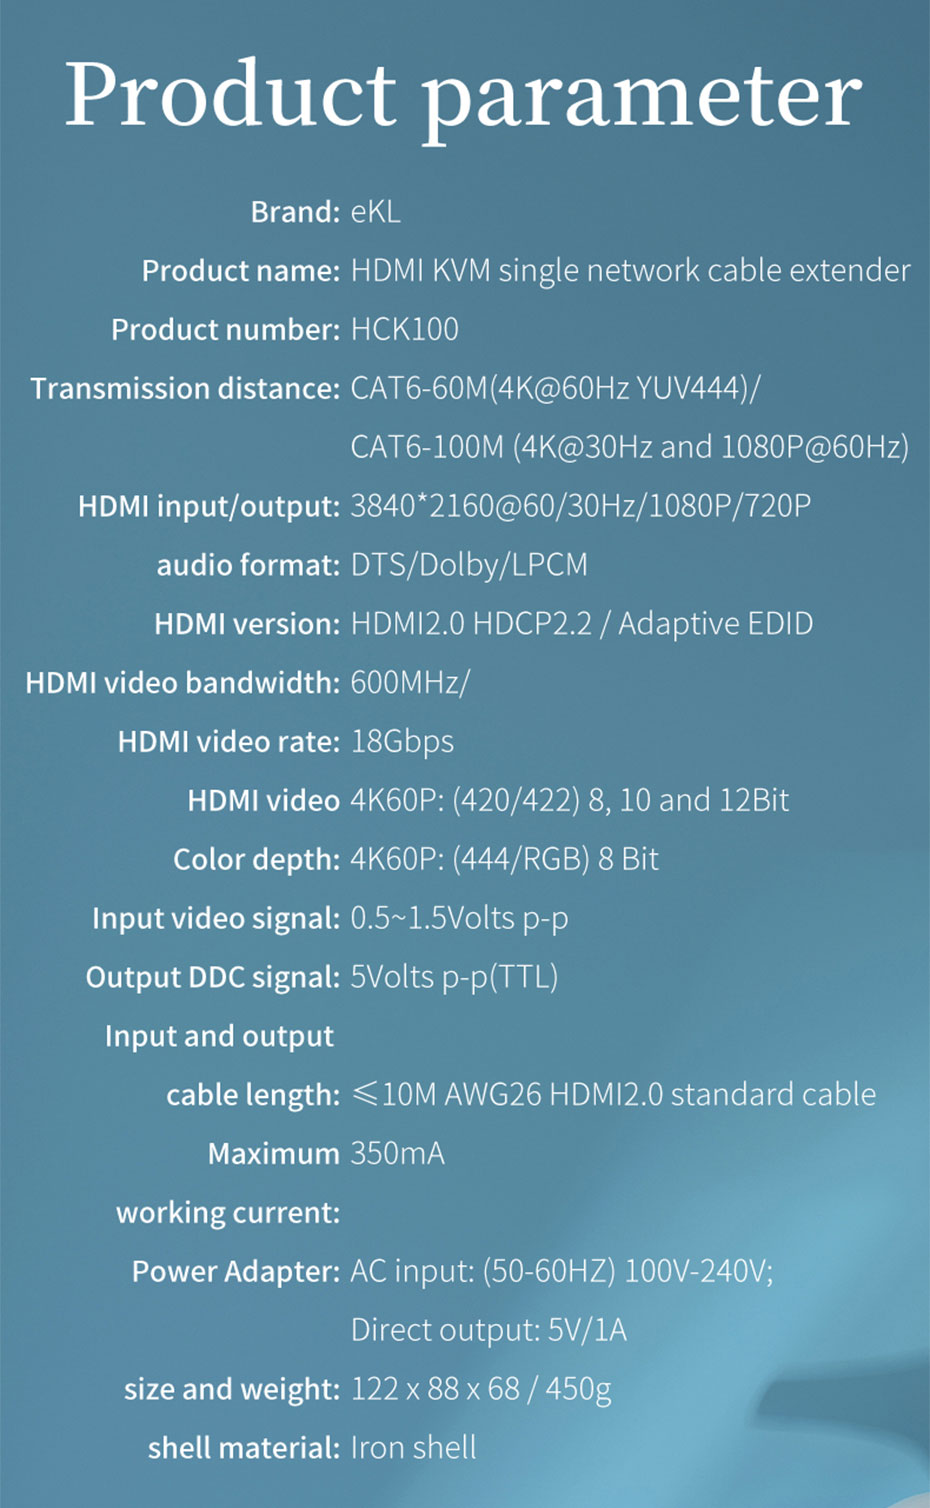 HDMI KVM extender 4K 100 meters HCK100 specifications